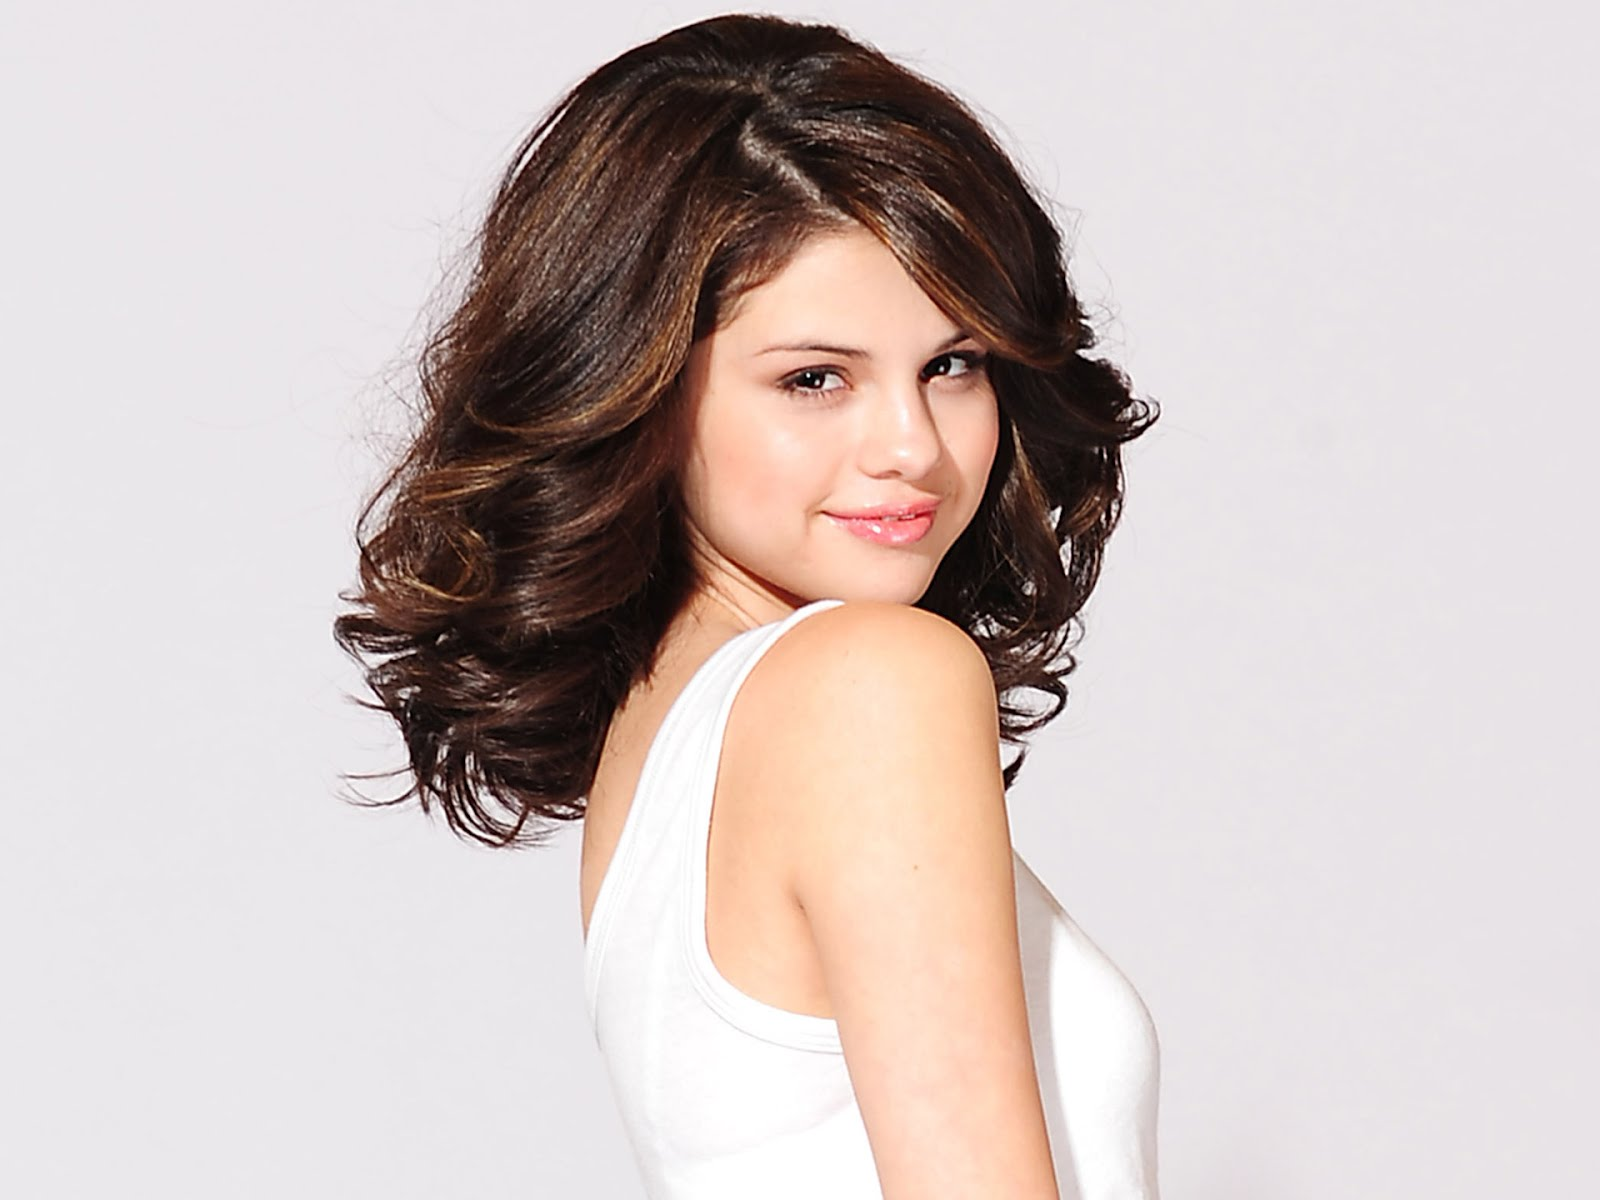 Beauty Models Images Selena Gomez